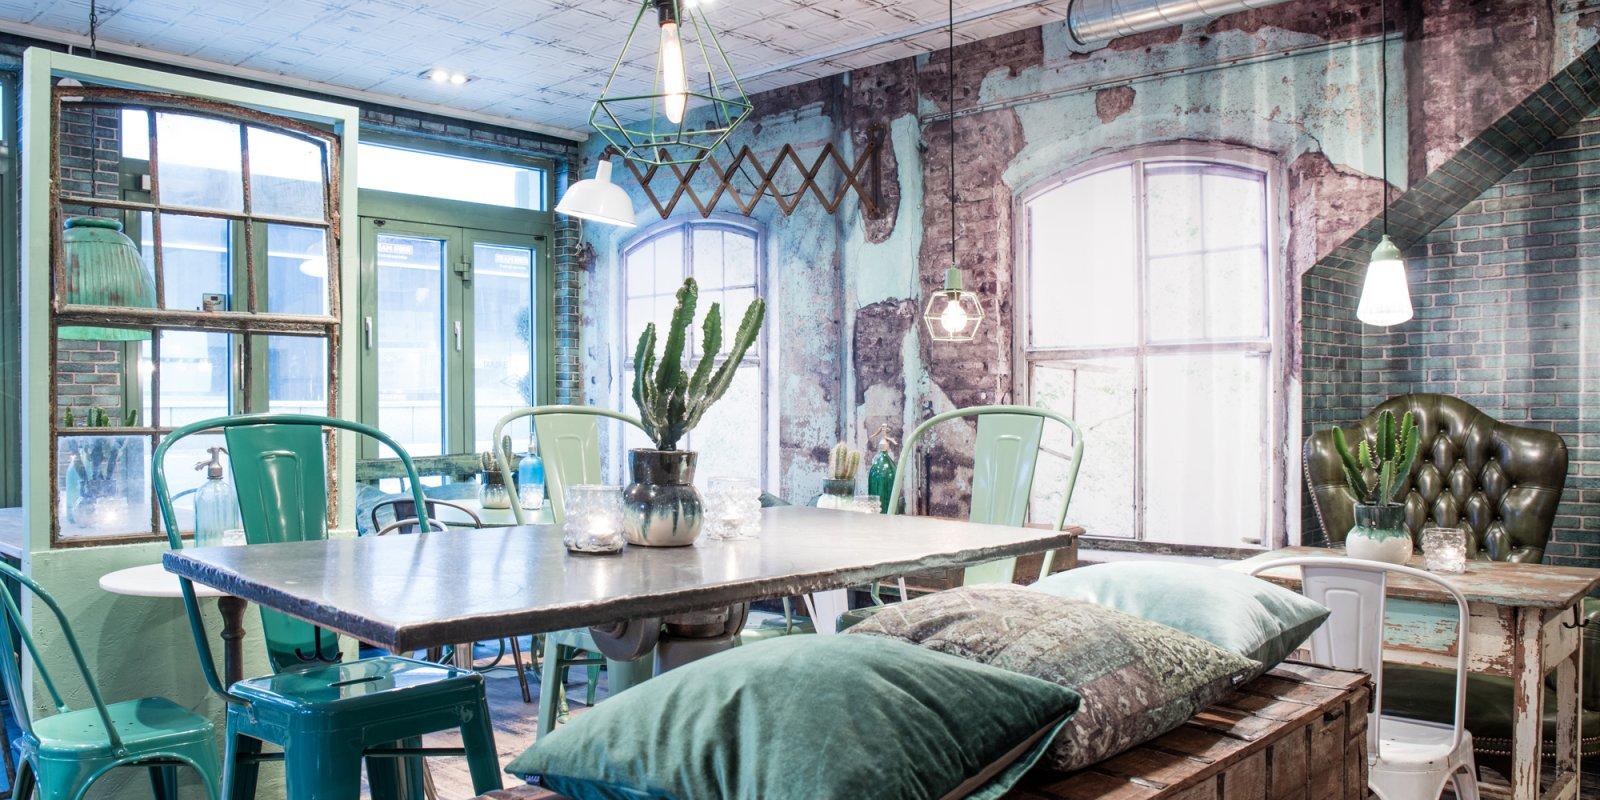 Café Viskan i Borås, Sverige. Designet og stylet af indretningsarkitekt Ann-Louise Håkansson fra  Hjärterum.